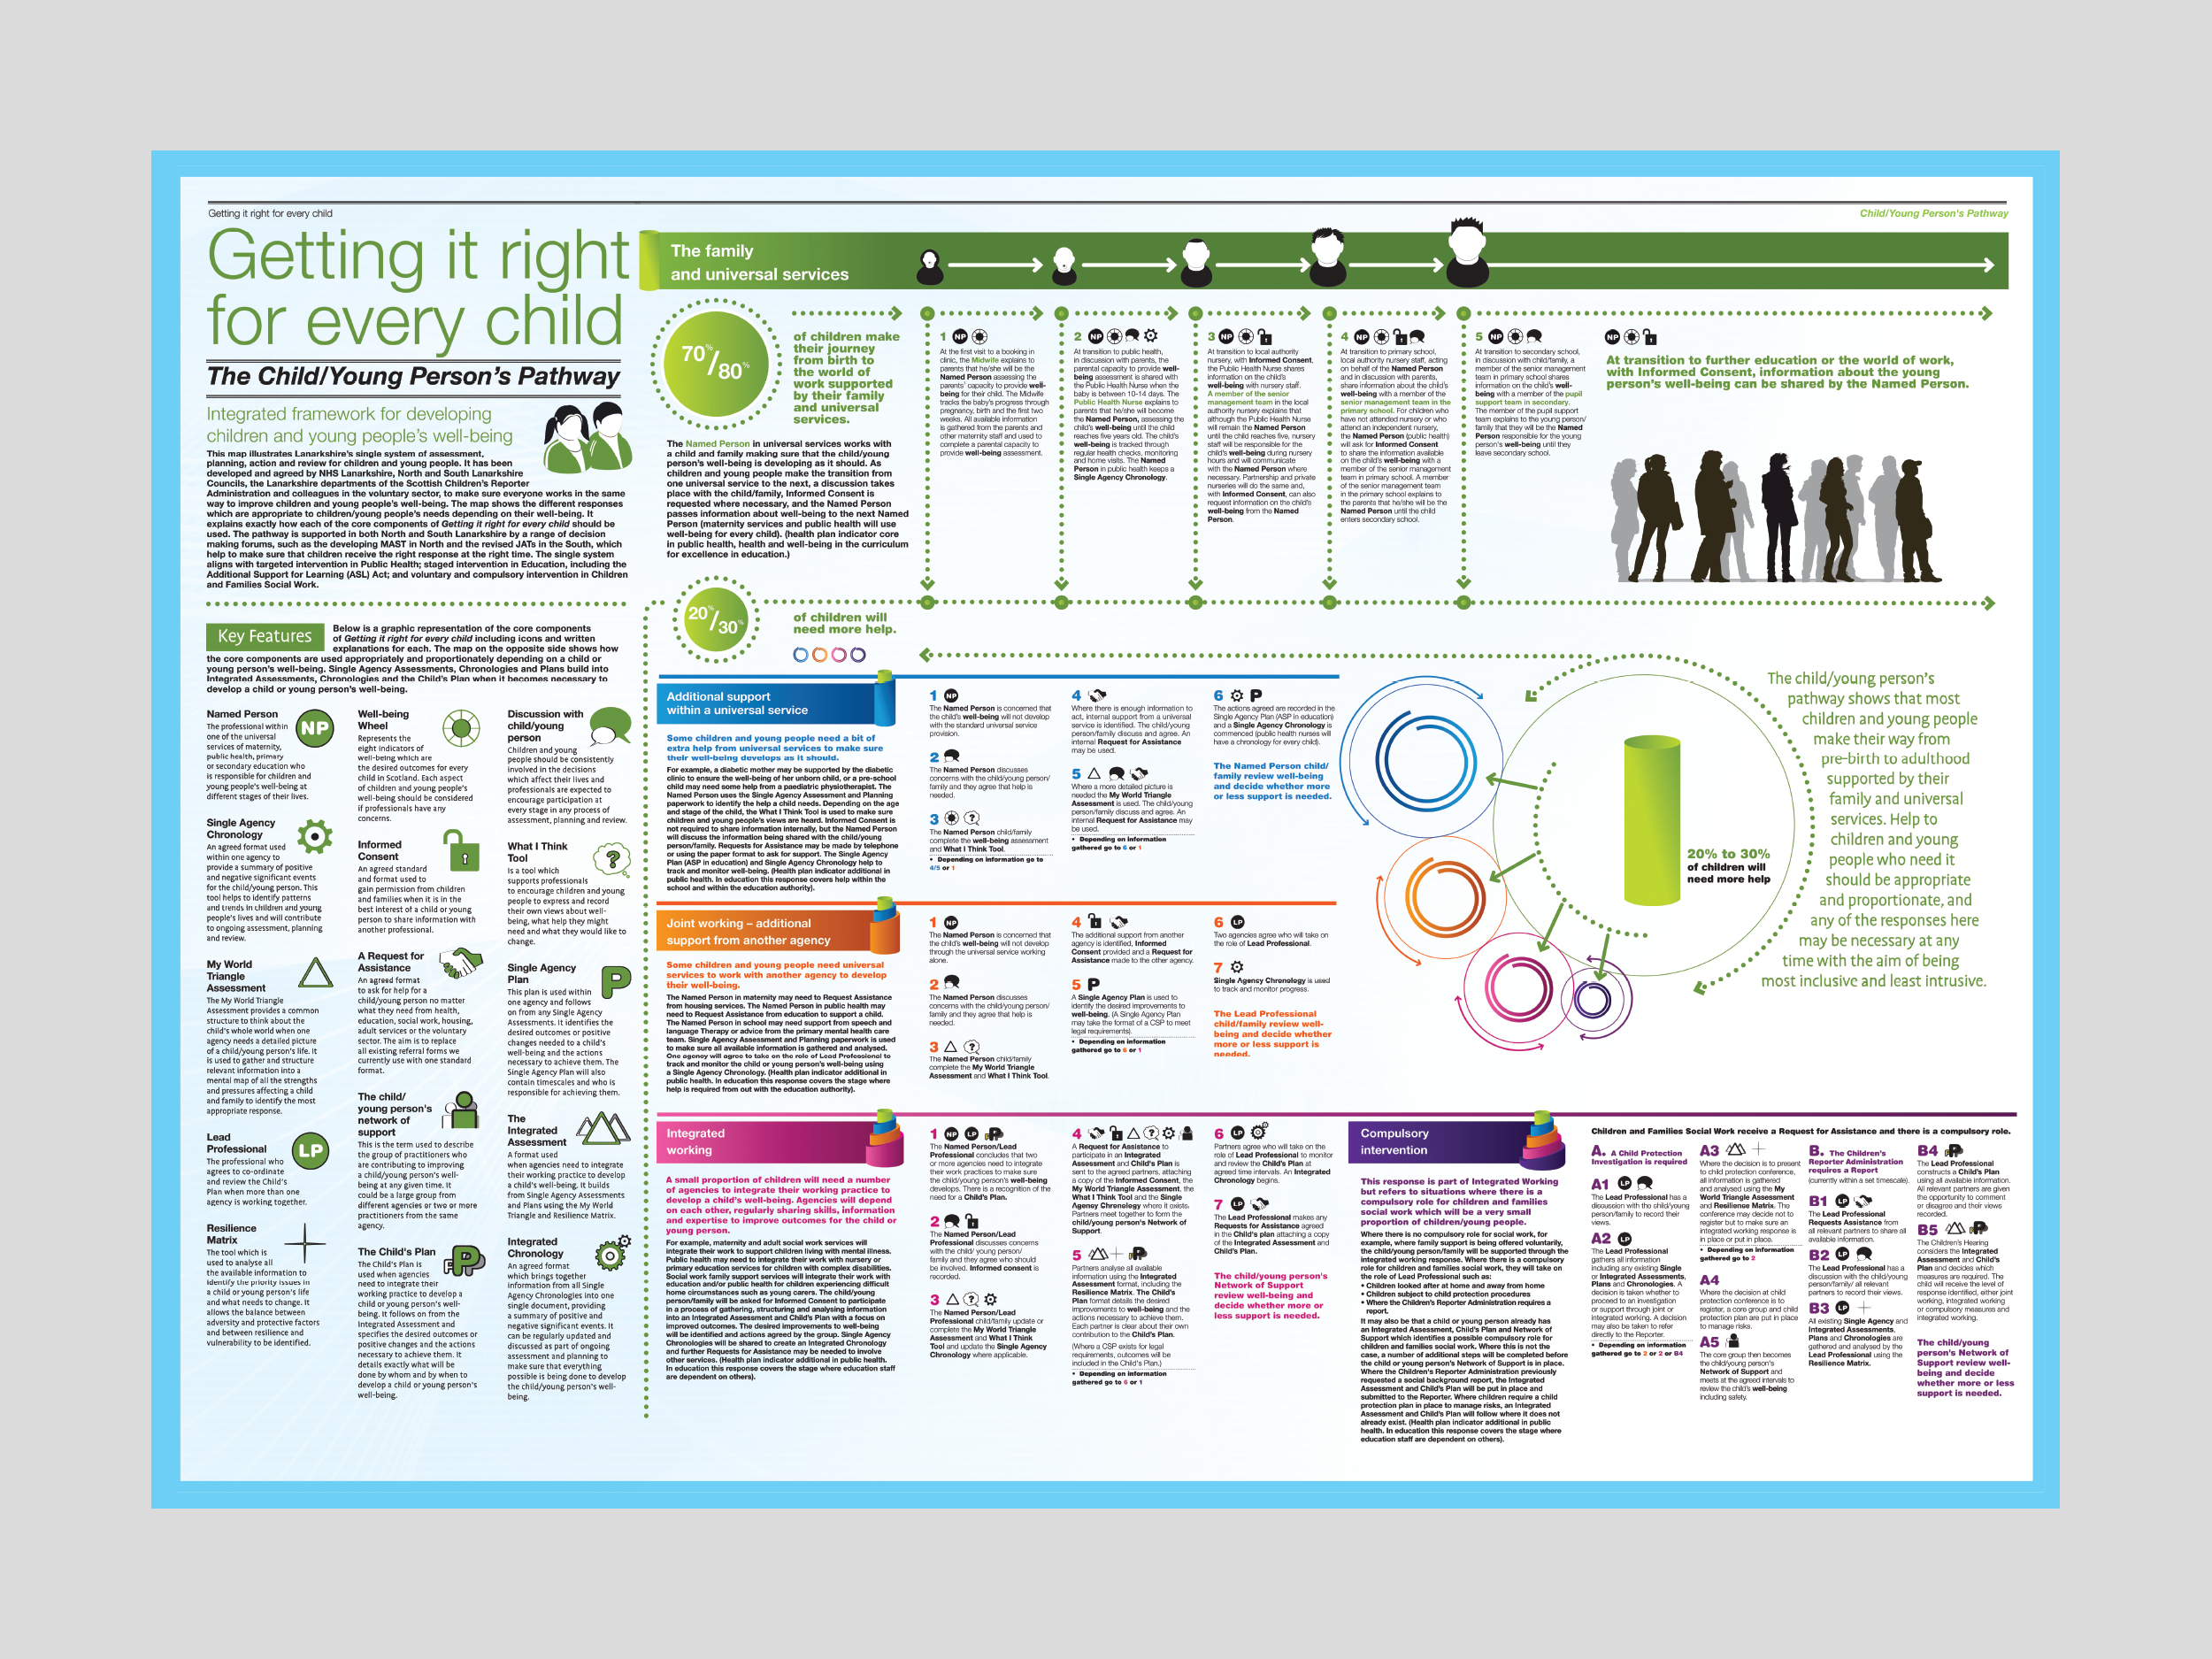 wellbeing_wheel_brochure_pathway